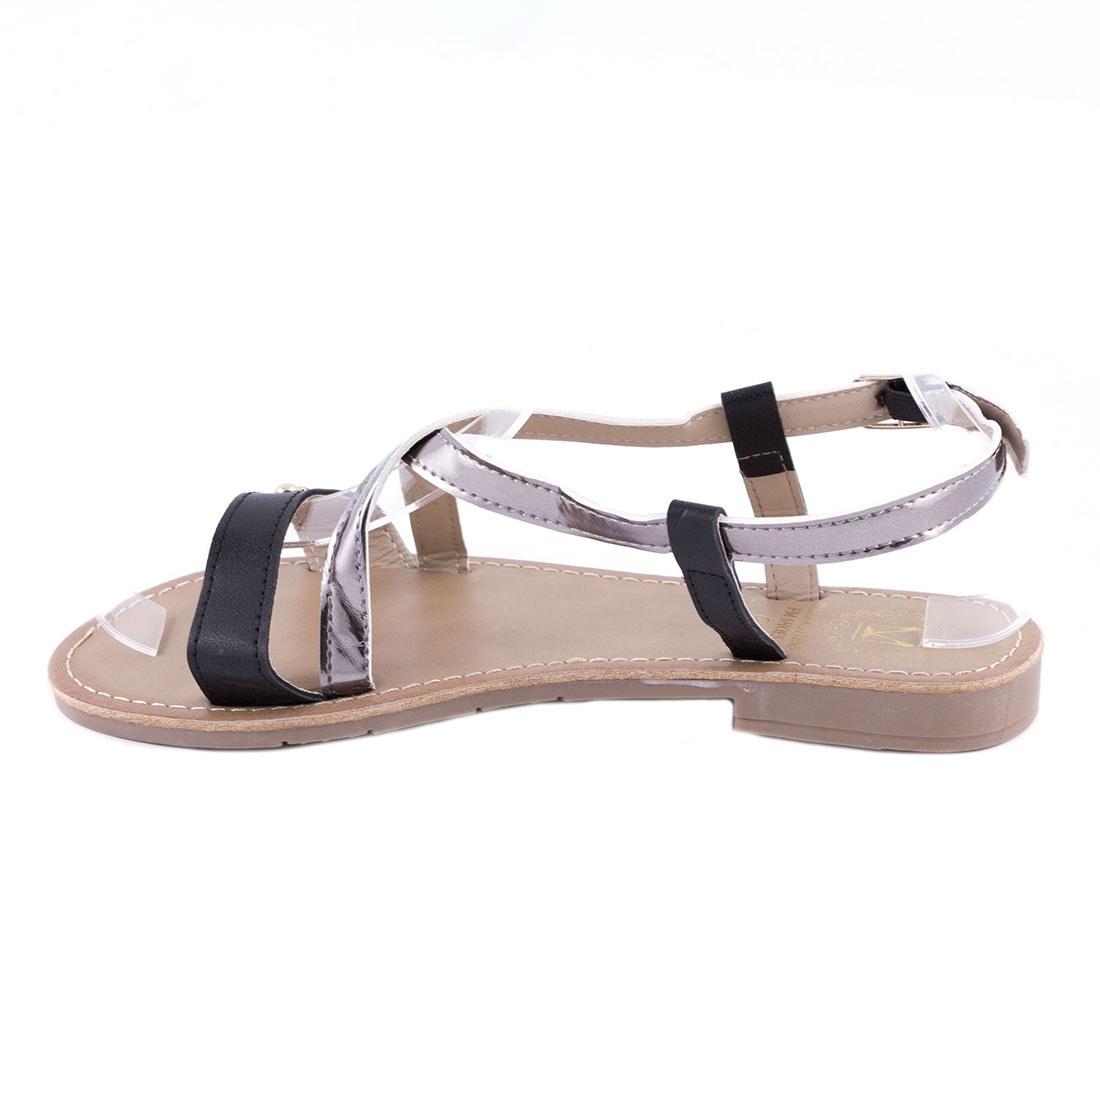 Sandale dama cu barete F-04-NEGRU